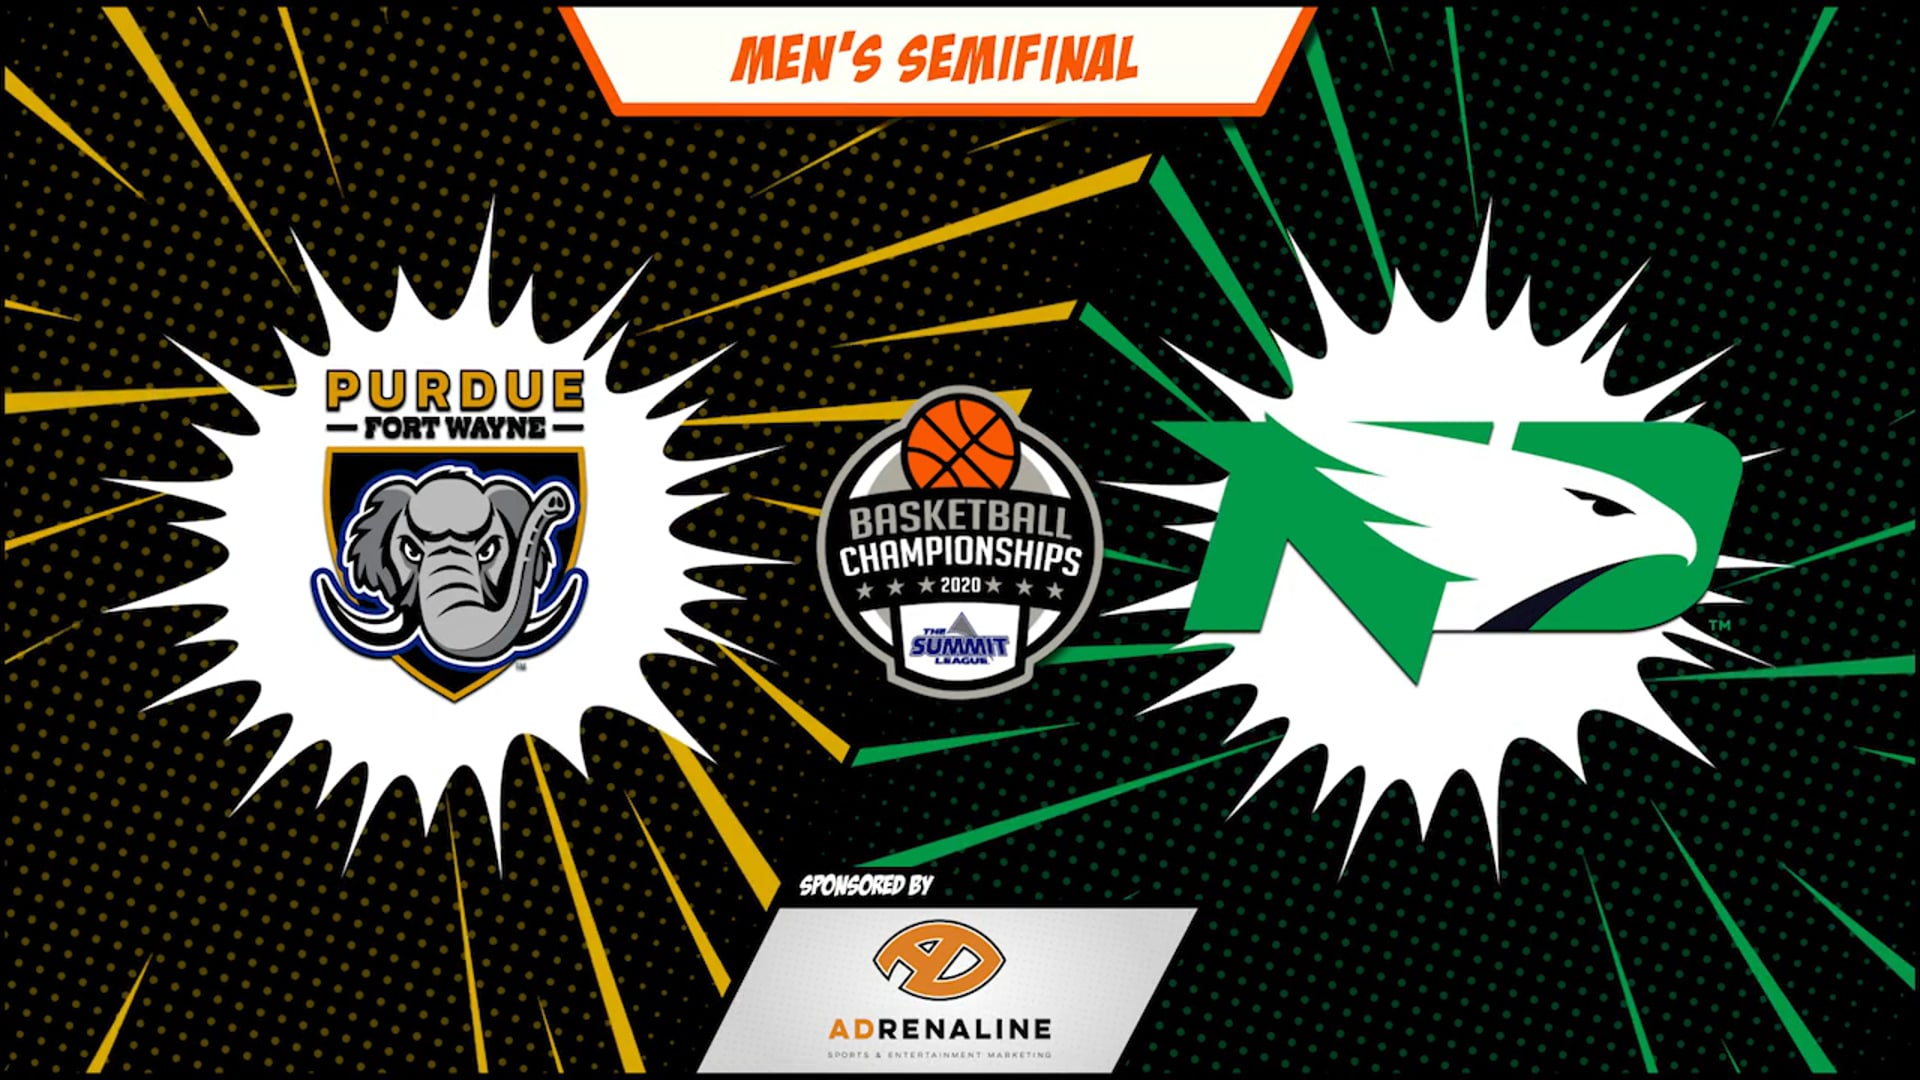 2020 Summit League Men's Round 2 - Purdue Fort Wayne vs North Dakota